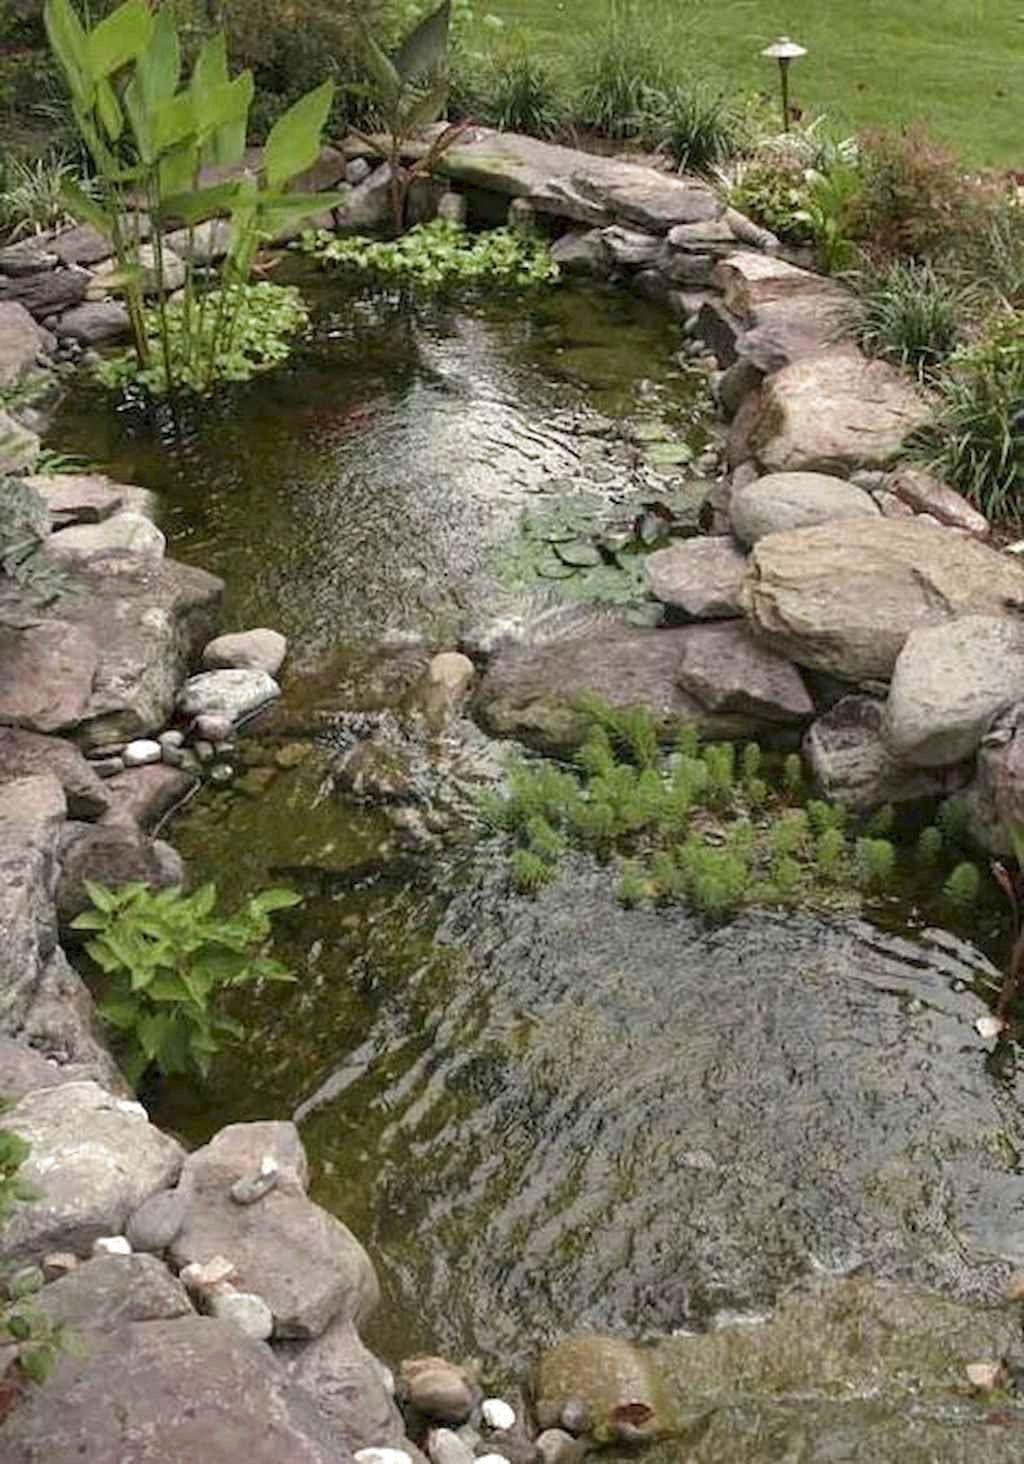 Backyard Ponds And Water Garden Landscaping Ideas Frugal Living Water Features In The Garden Garden Pond Design Ponds Backyard